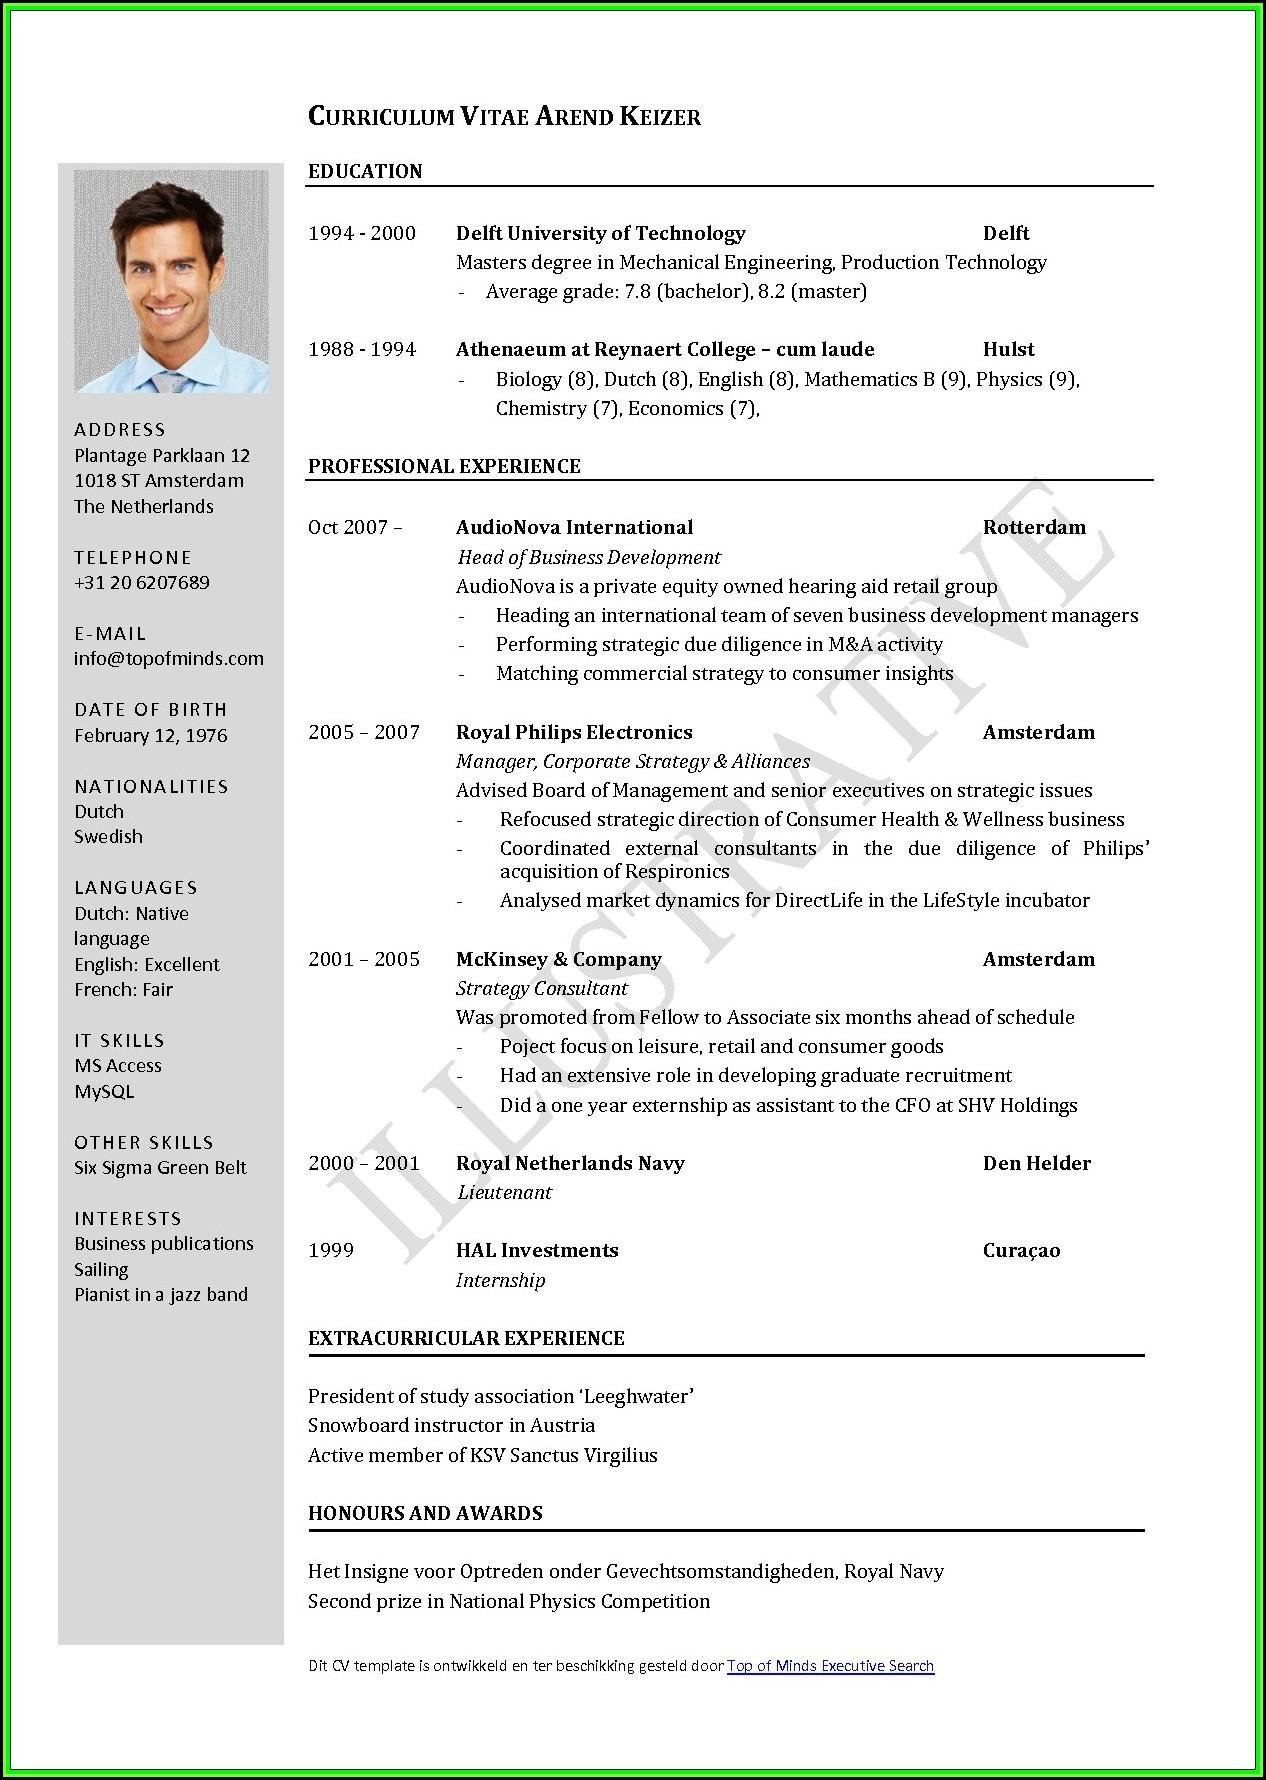 Free Curriculum Vitae Samples Downloads